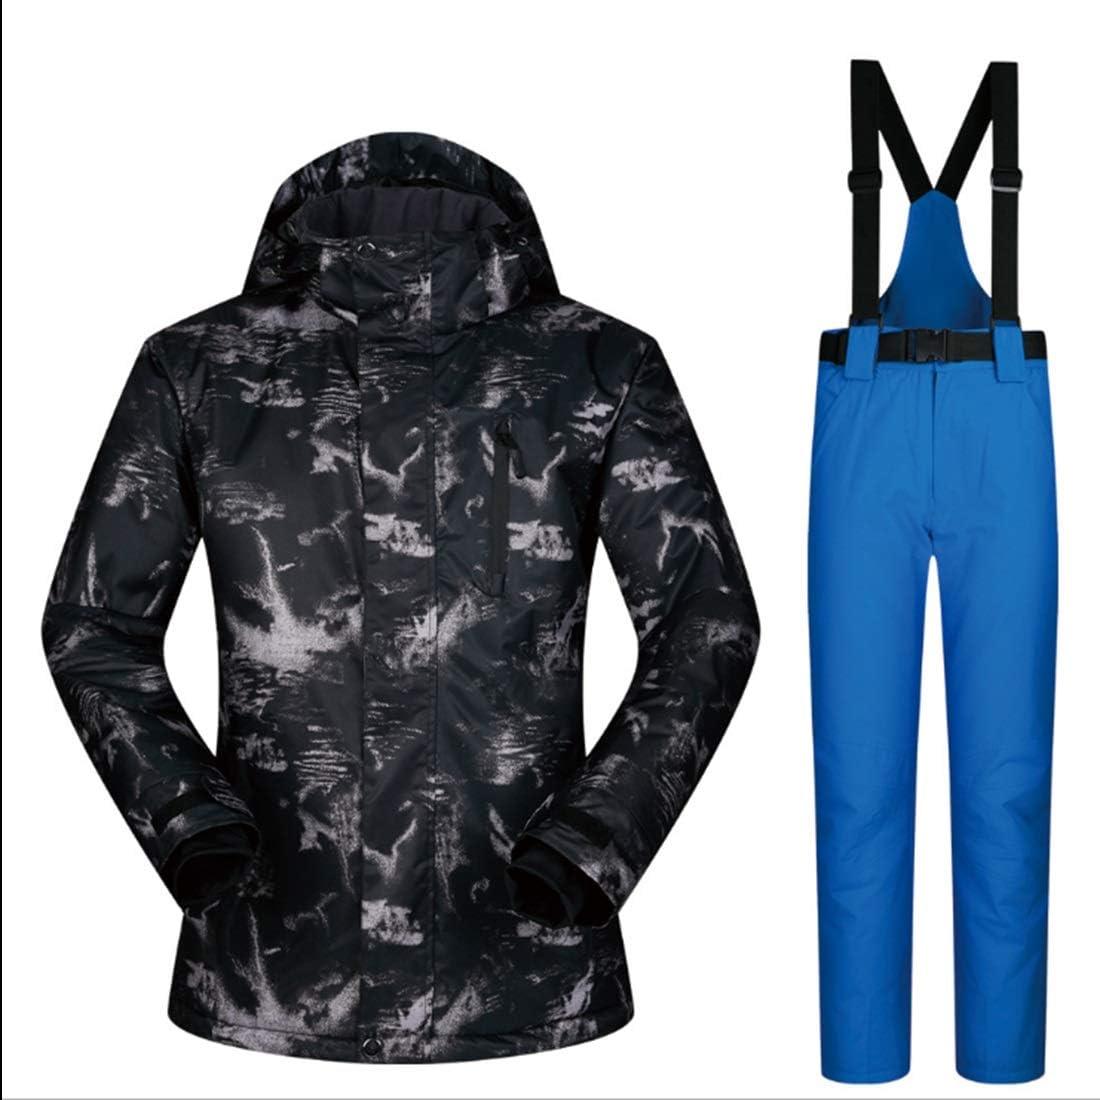 LilyAngel メンズマウンテン防水スキージャケットwindproofレインジャケット  Medium